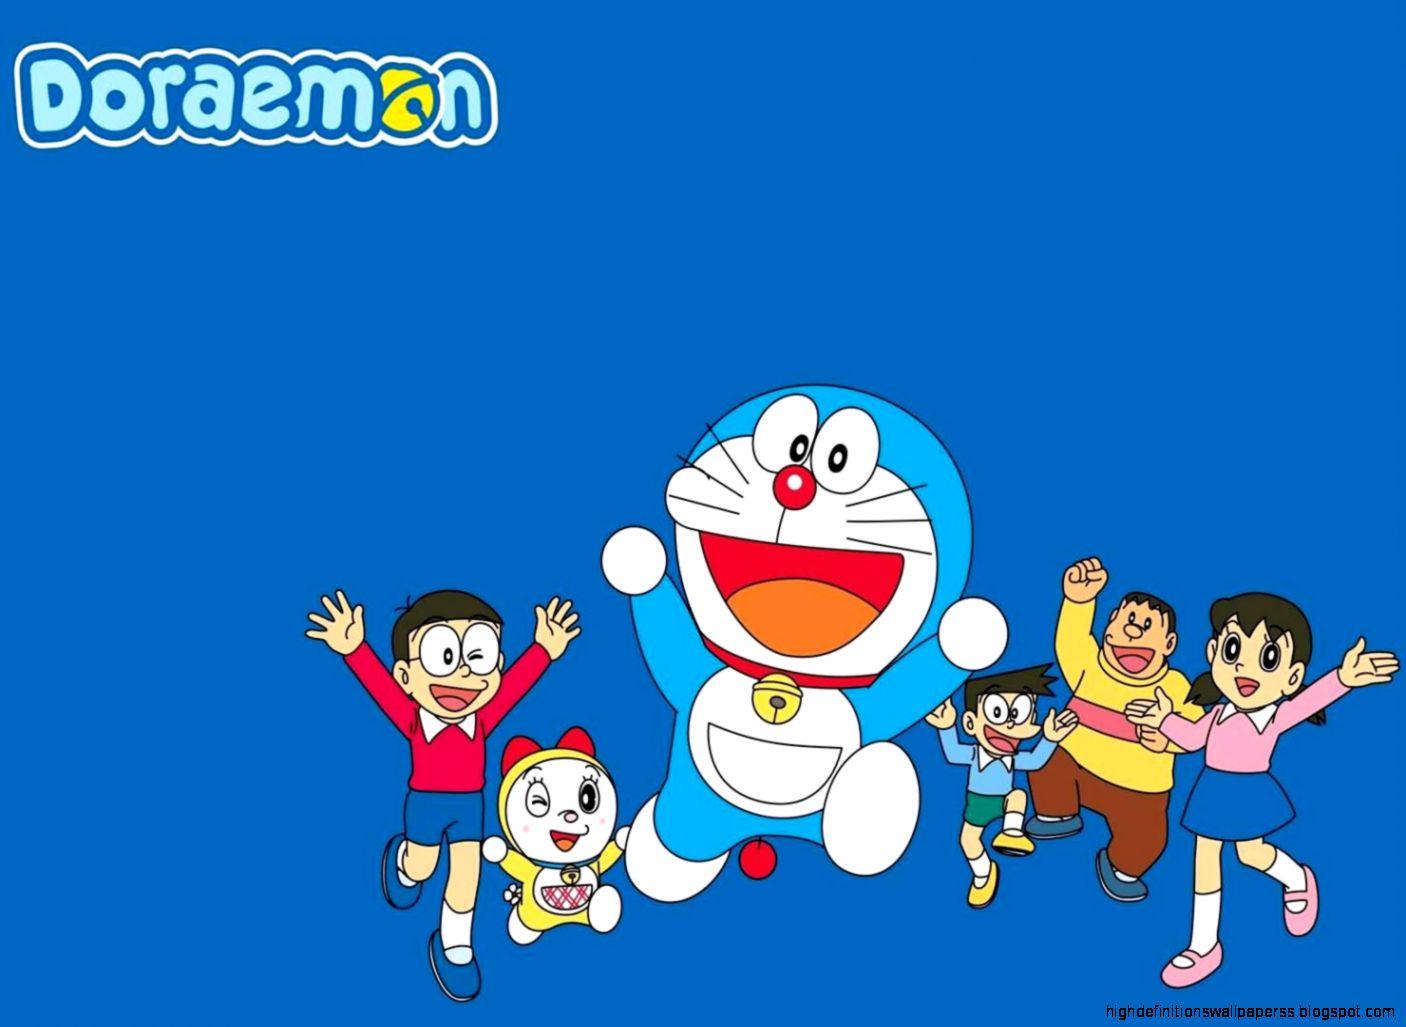 Doraemon And Nobita Cute Photo Wallpapers Hd | High ...